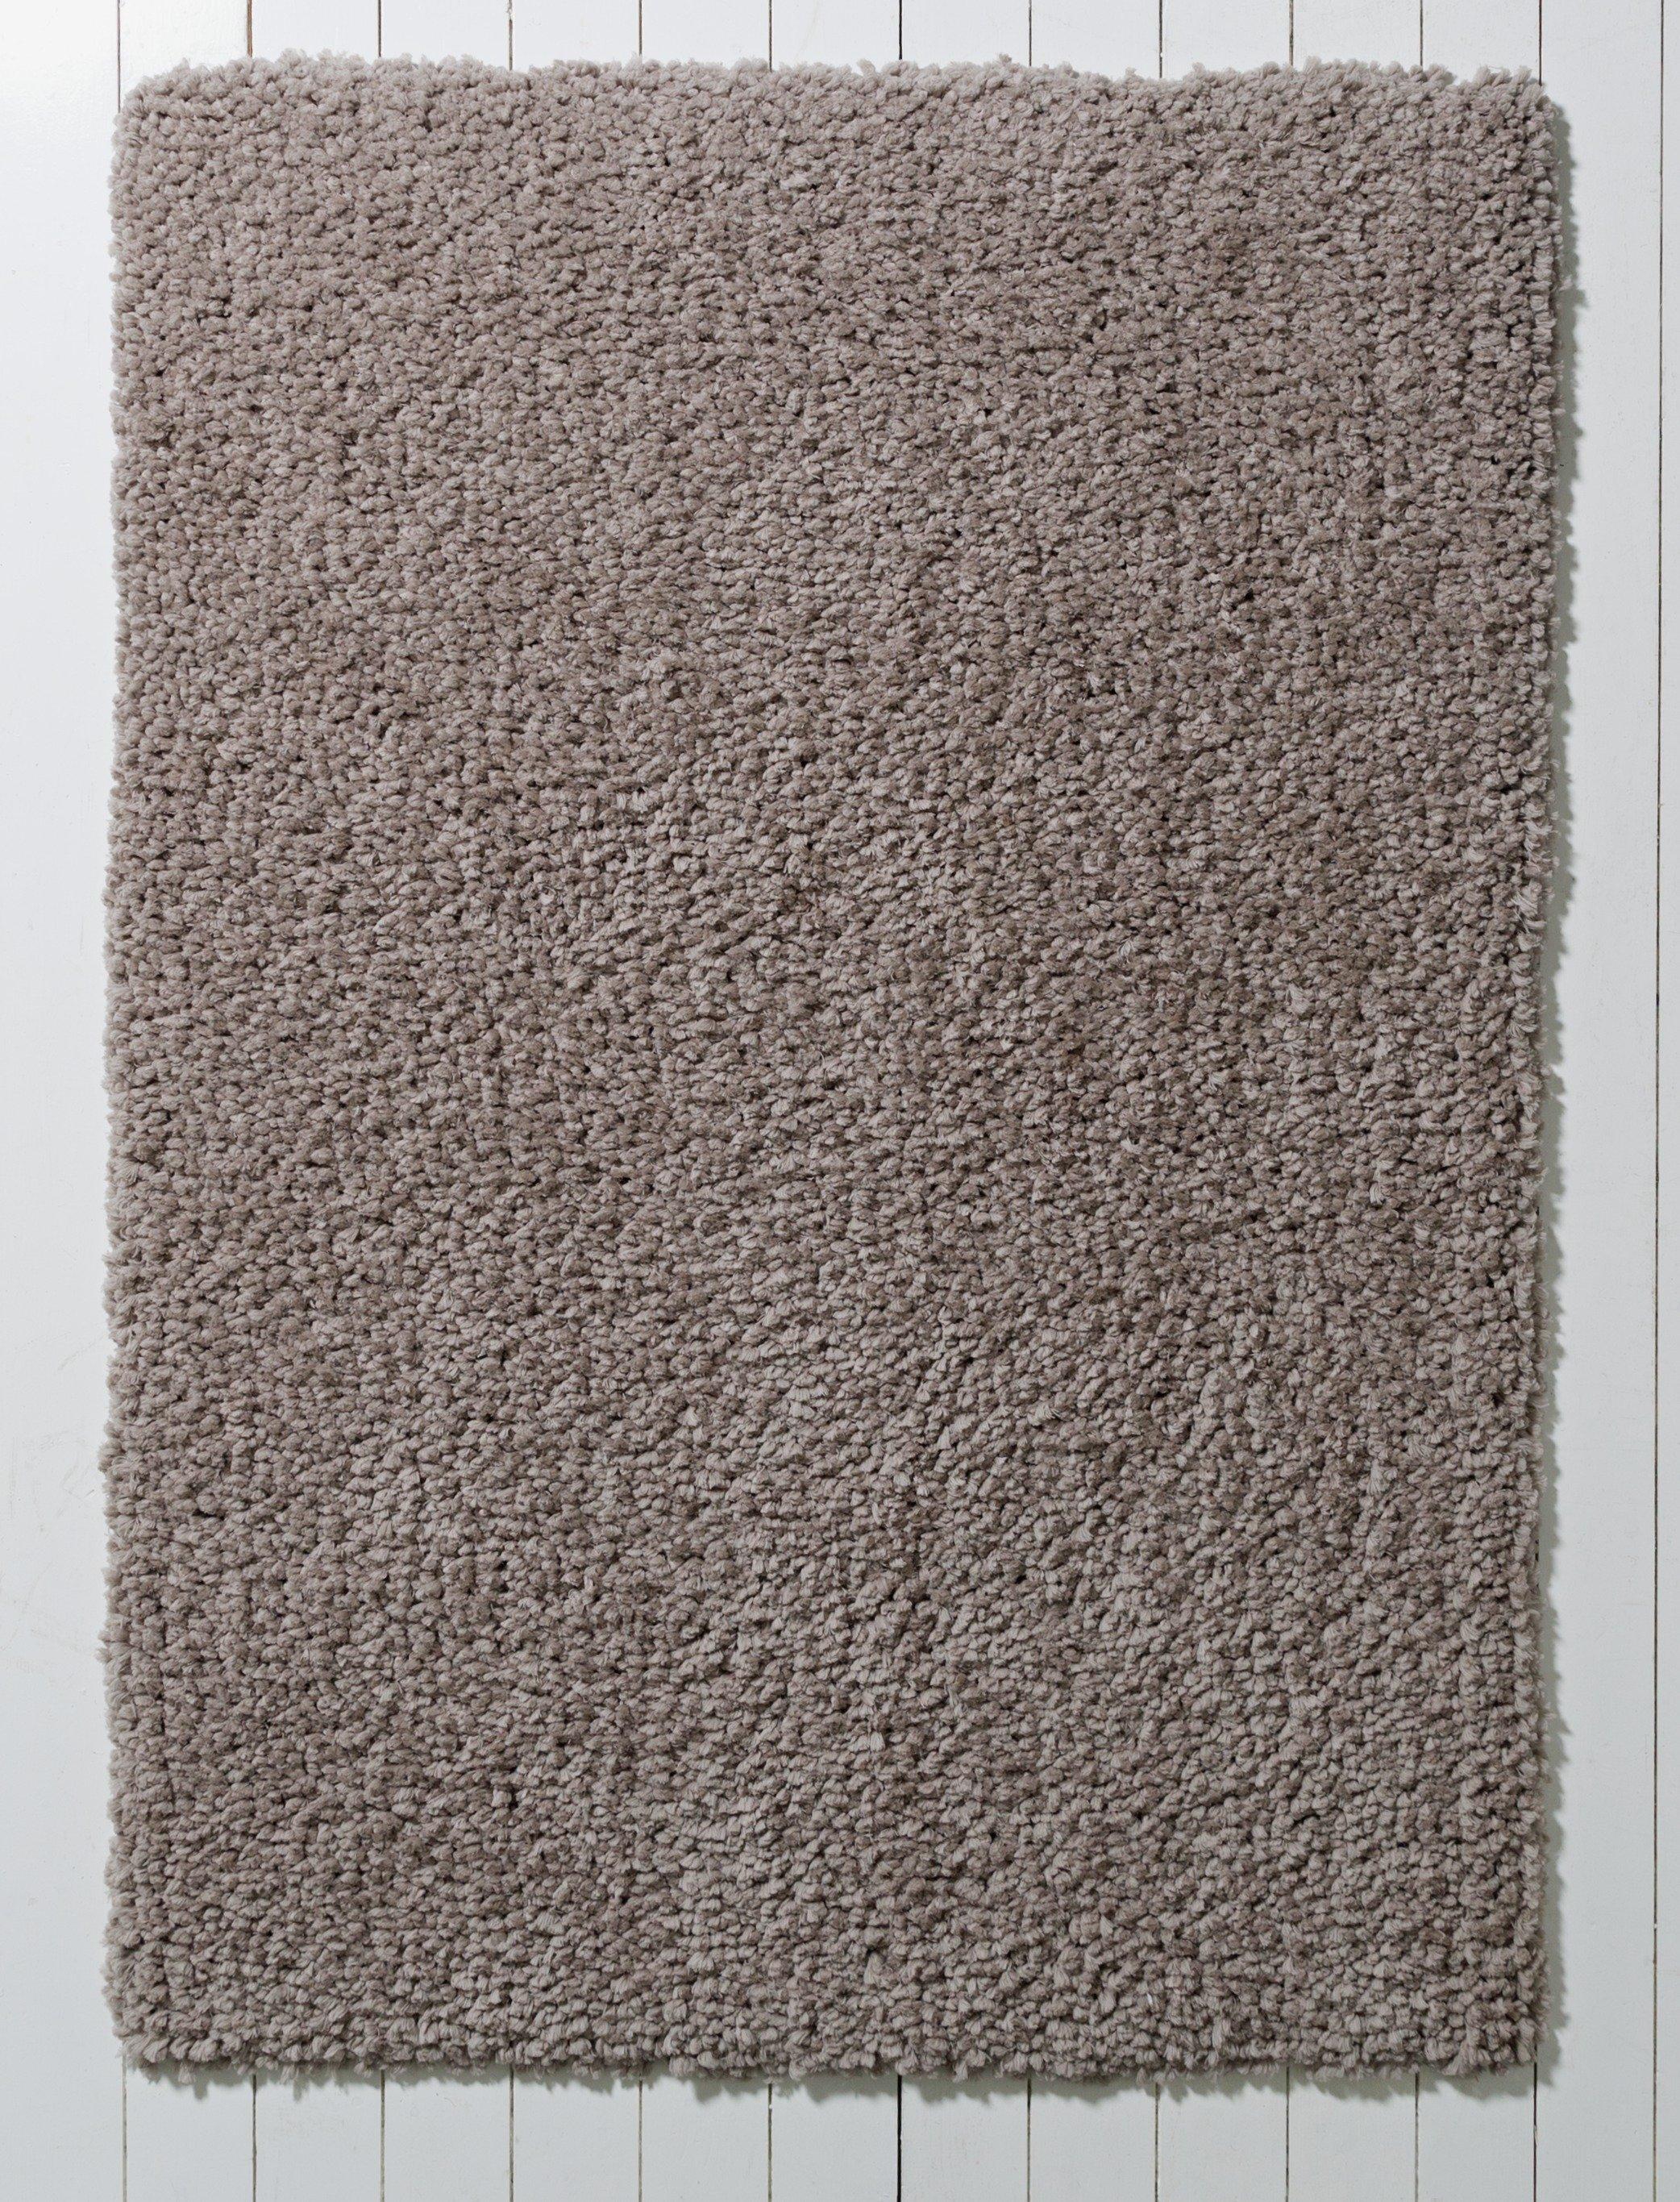 Collection Flump Shaggy Rug - 230x160cm - Latte